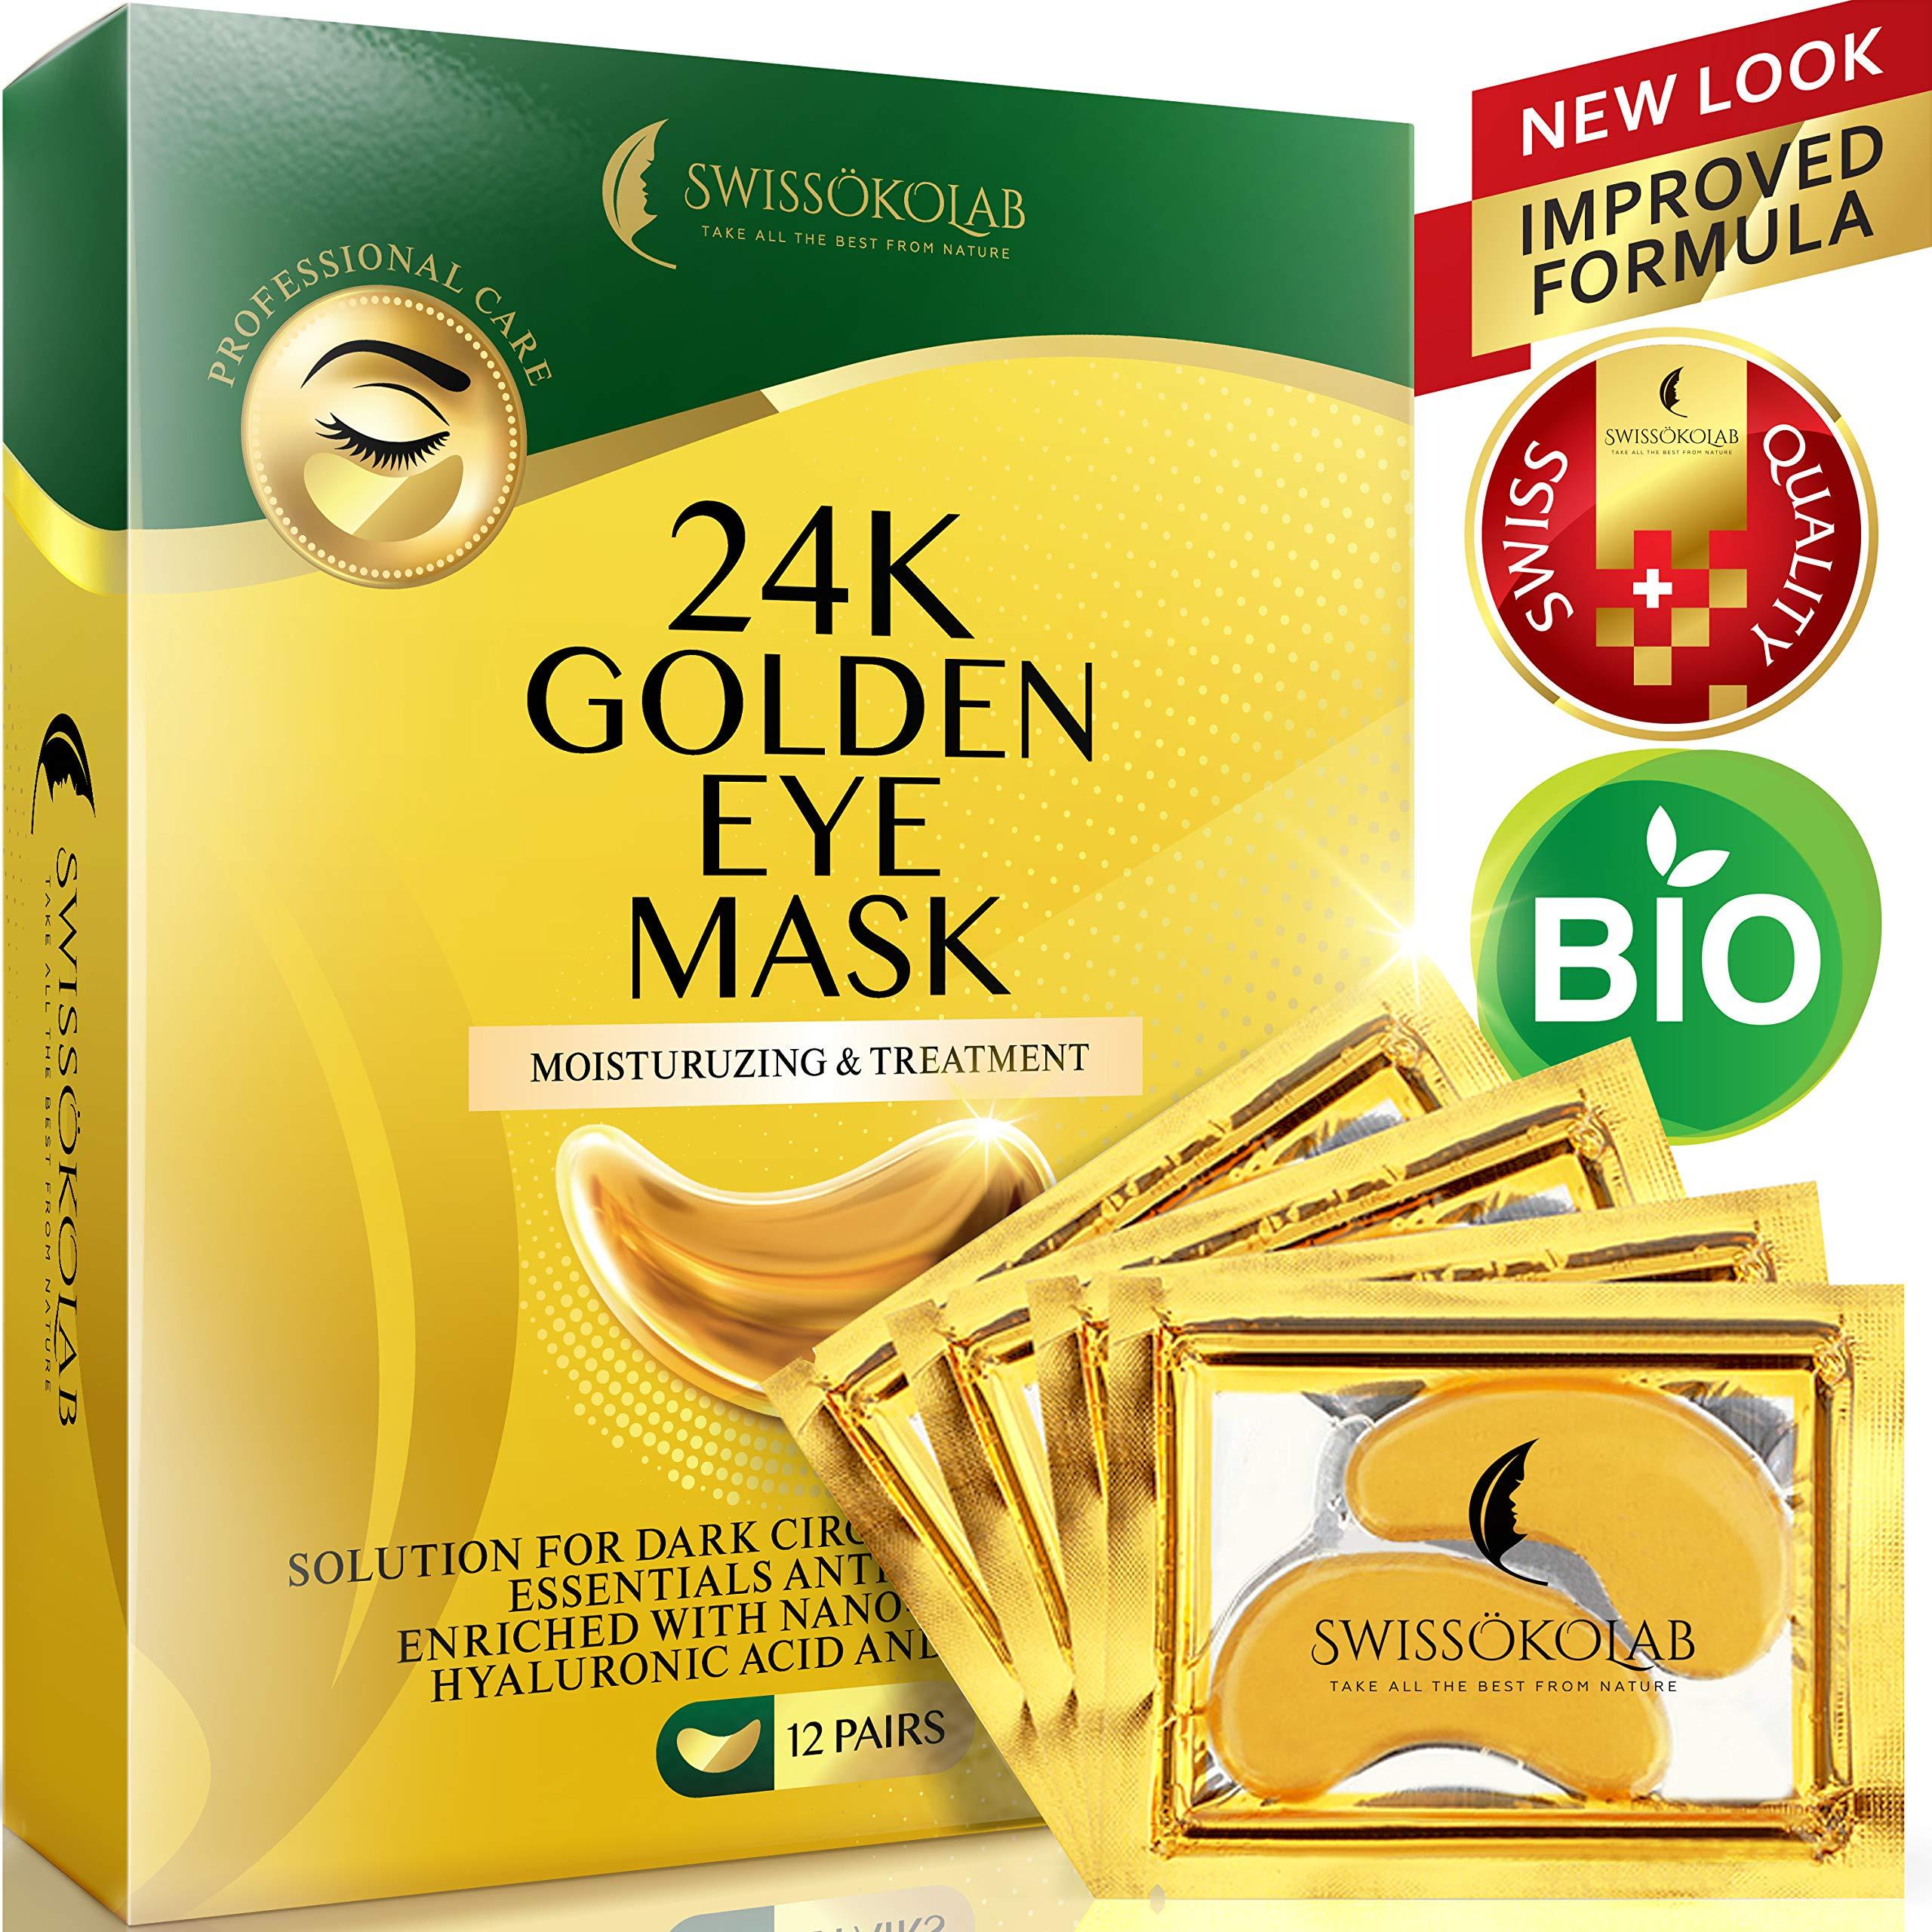 Under Eye Mask Gold Eye Mask Anti-Aging Hyaluronic Acid 24k Gold Eye Patches Under Eye Pads for Moisturizing & Reducing Dark Circles Puffiness Wrinkles by SWISSÖKOLAB